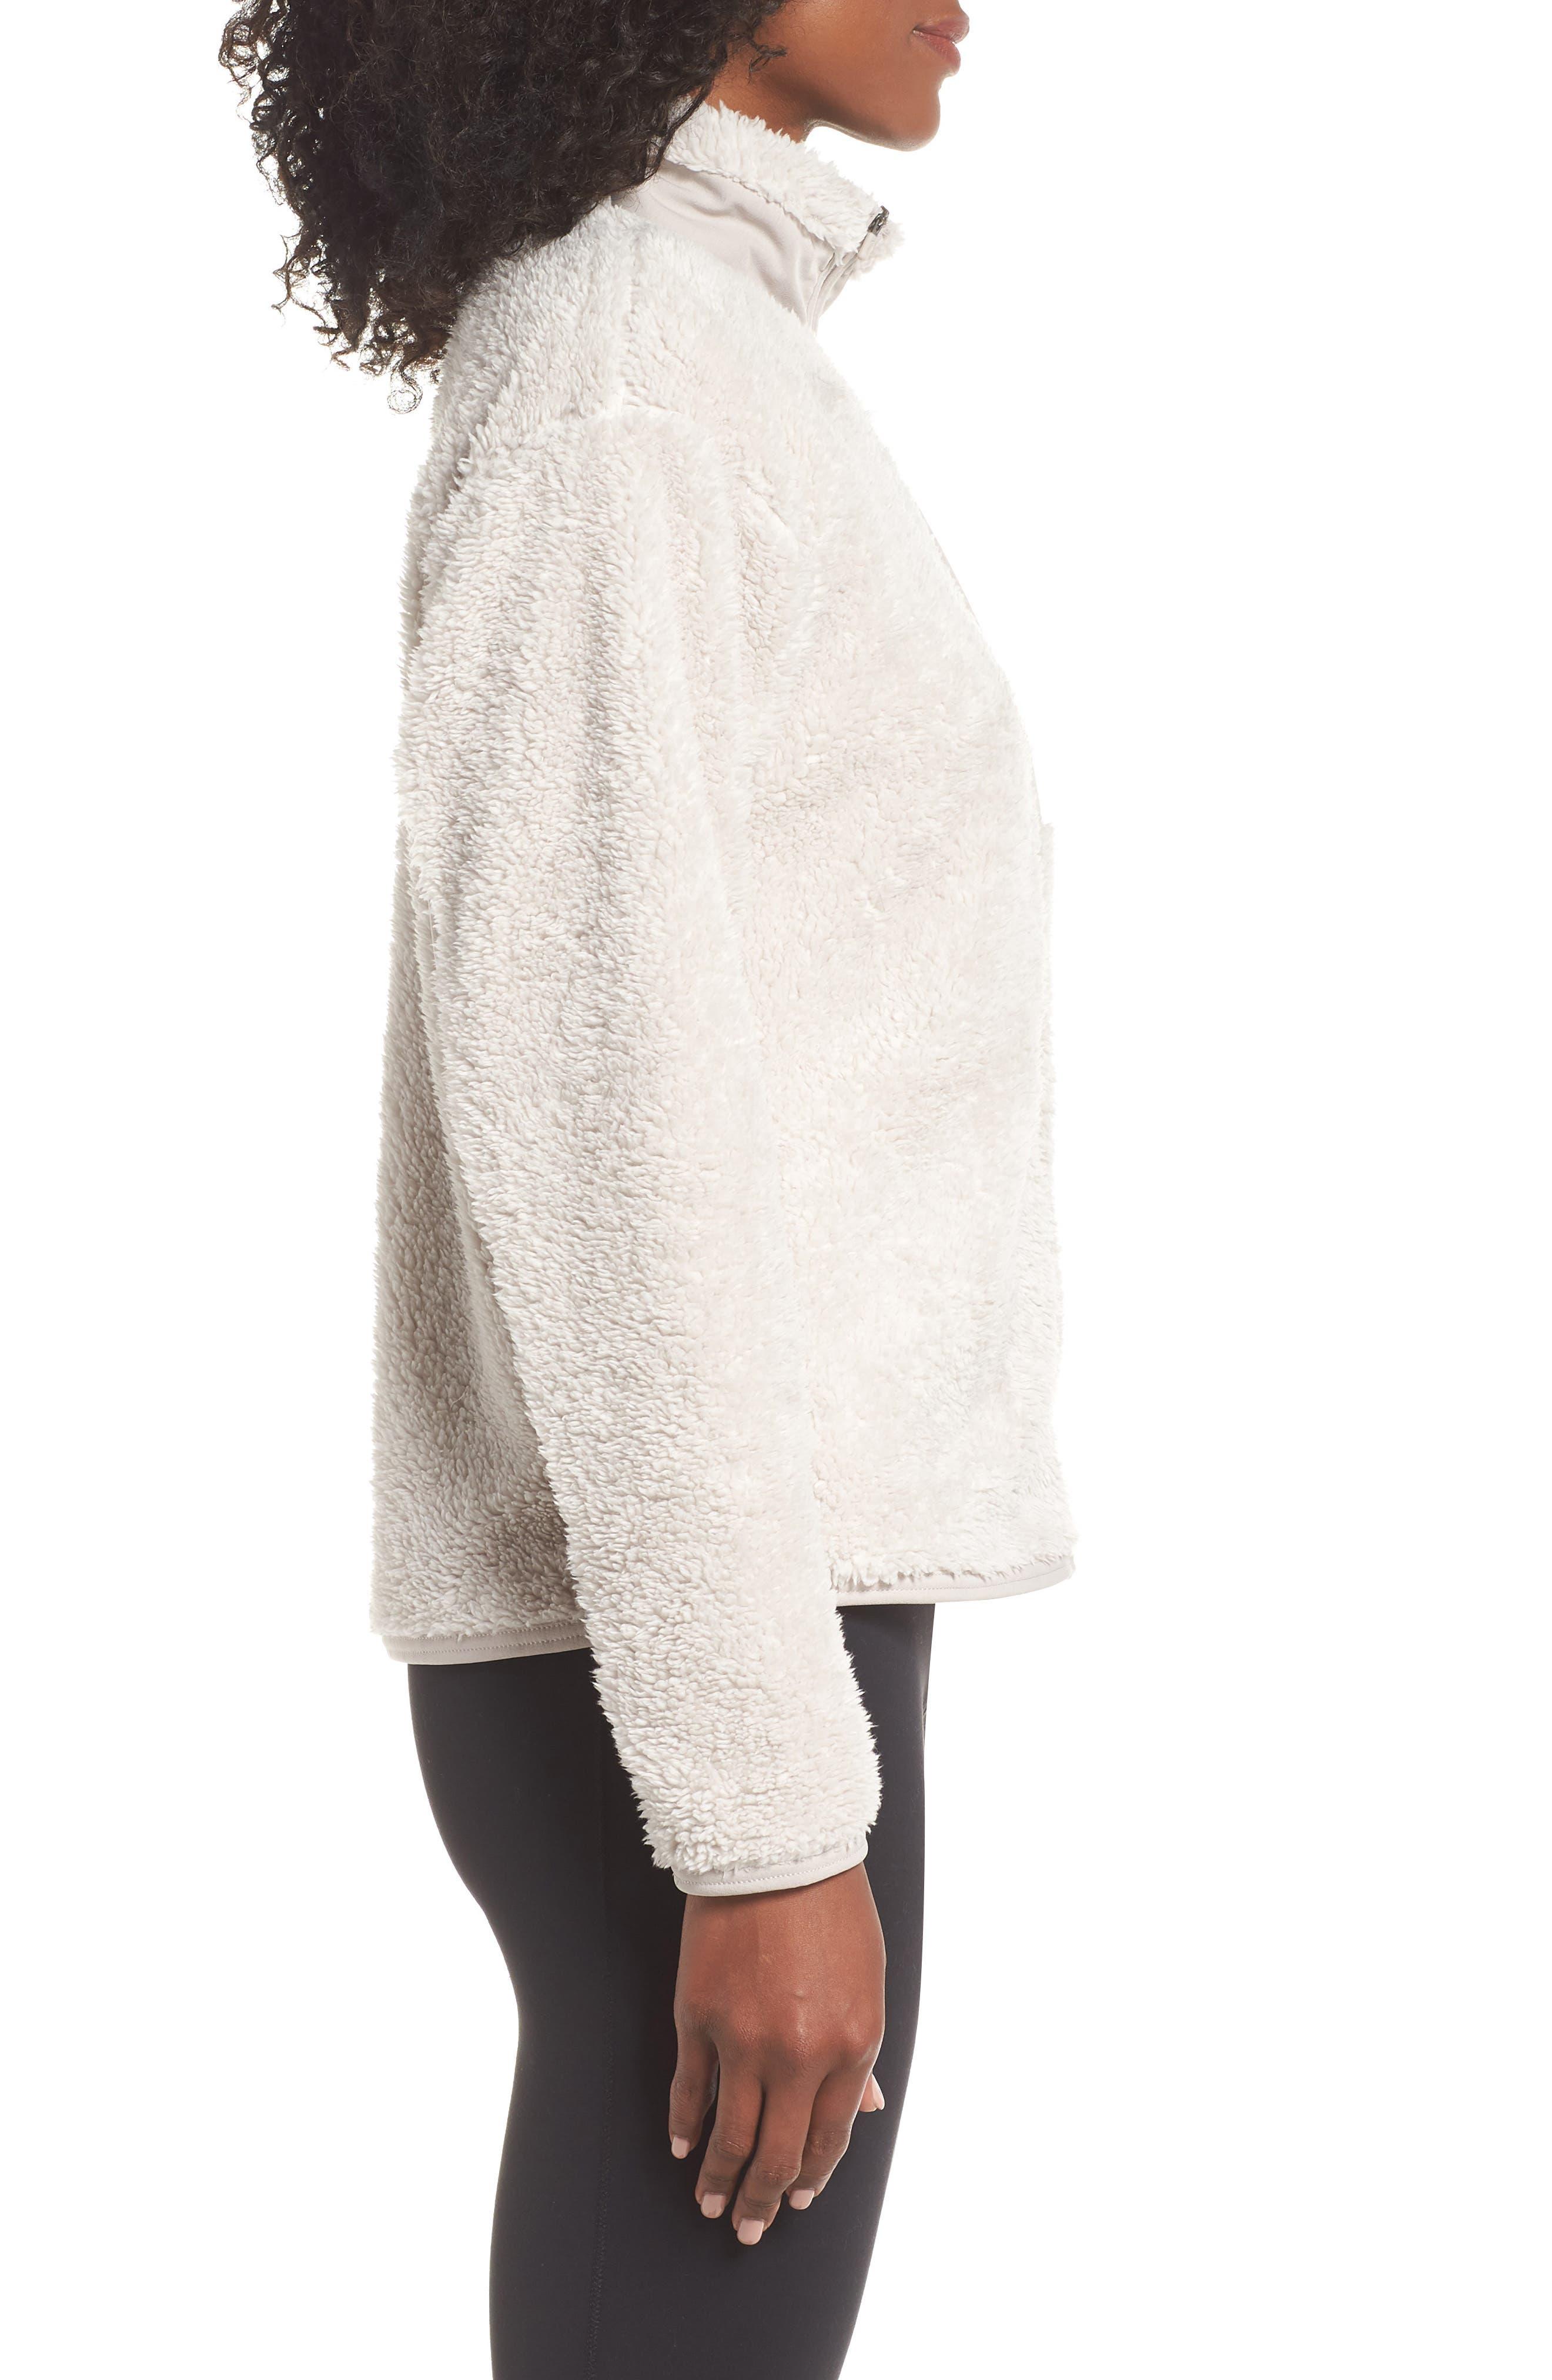 Therma Women's Full Zip Fleece Training Top,                             Alternate thumbnail 3, color,                             DESERT SAND/ MOON PARTICLE